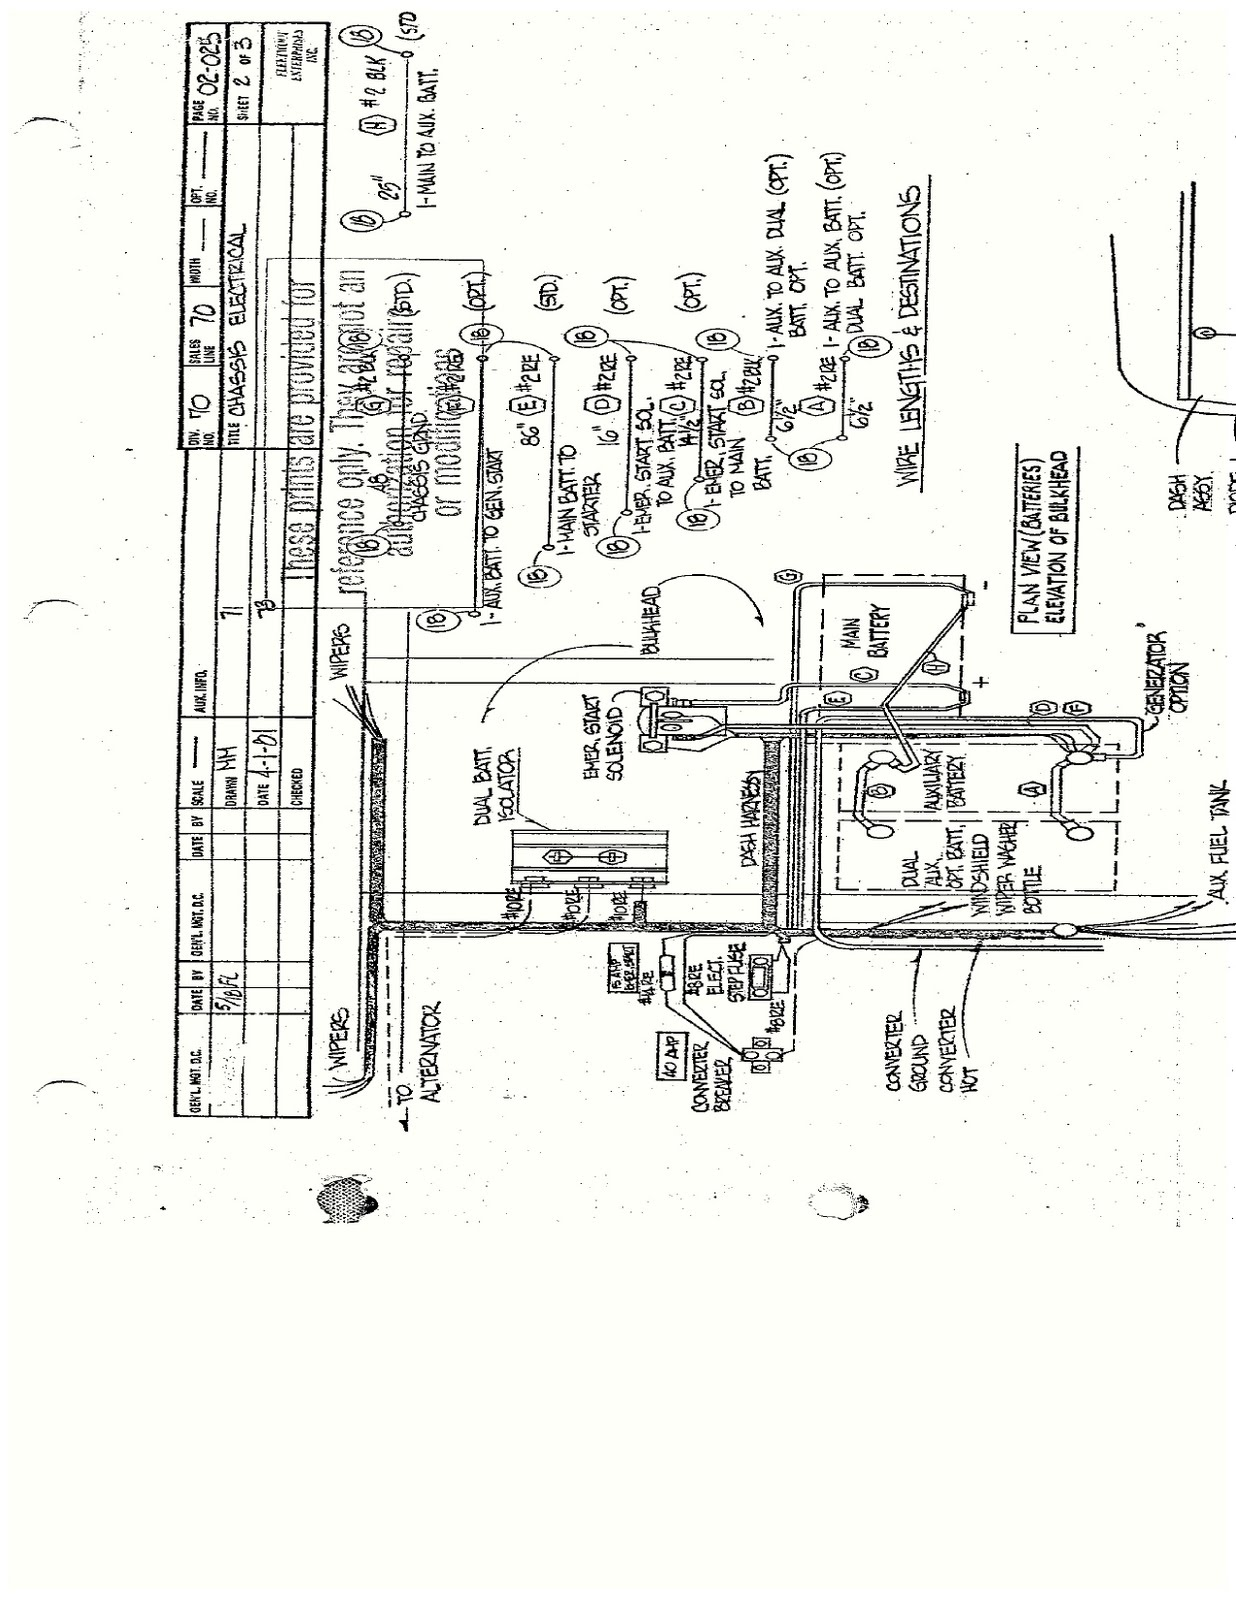 30 Chev P 30 Wiring Diagram S